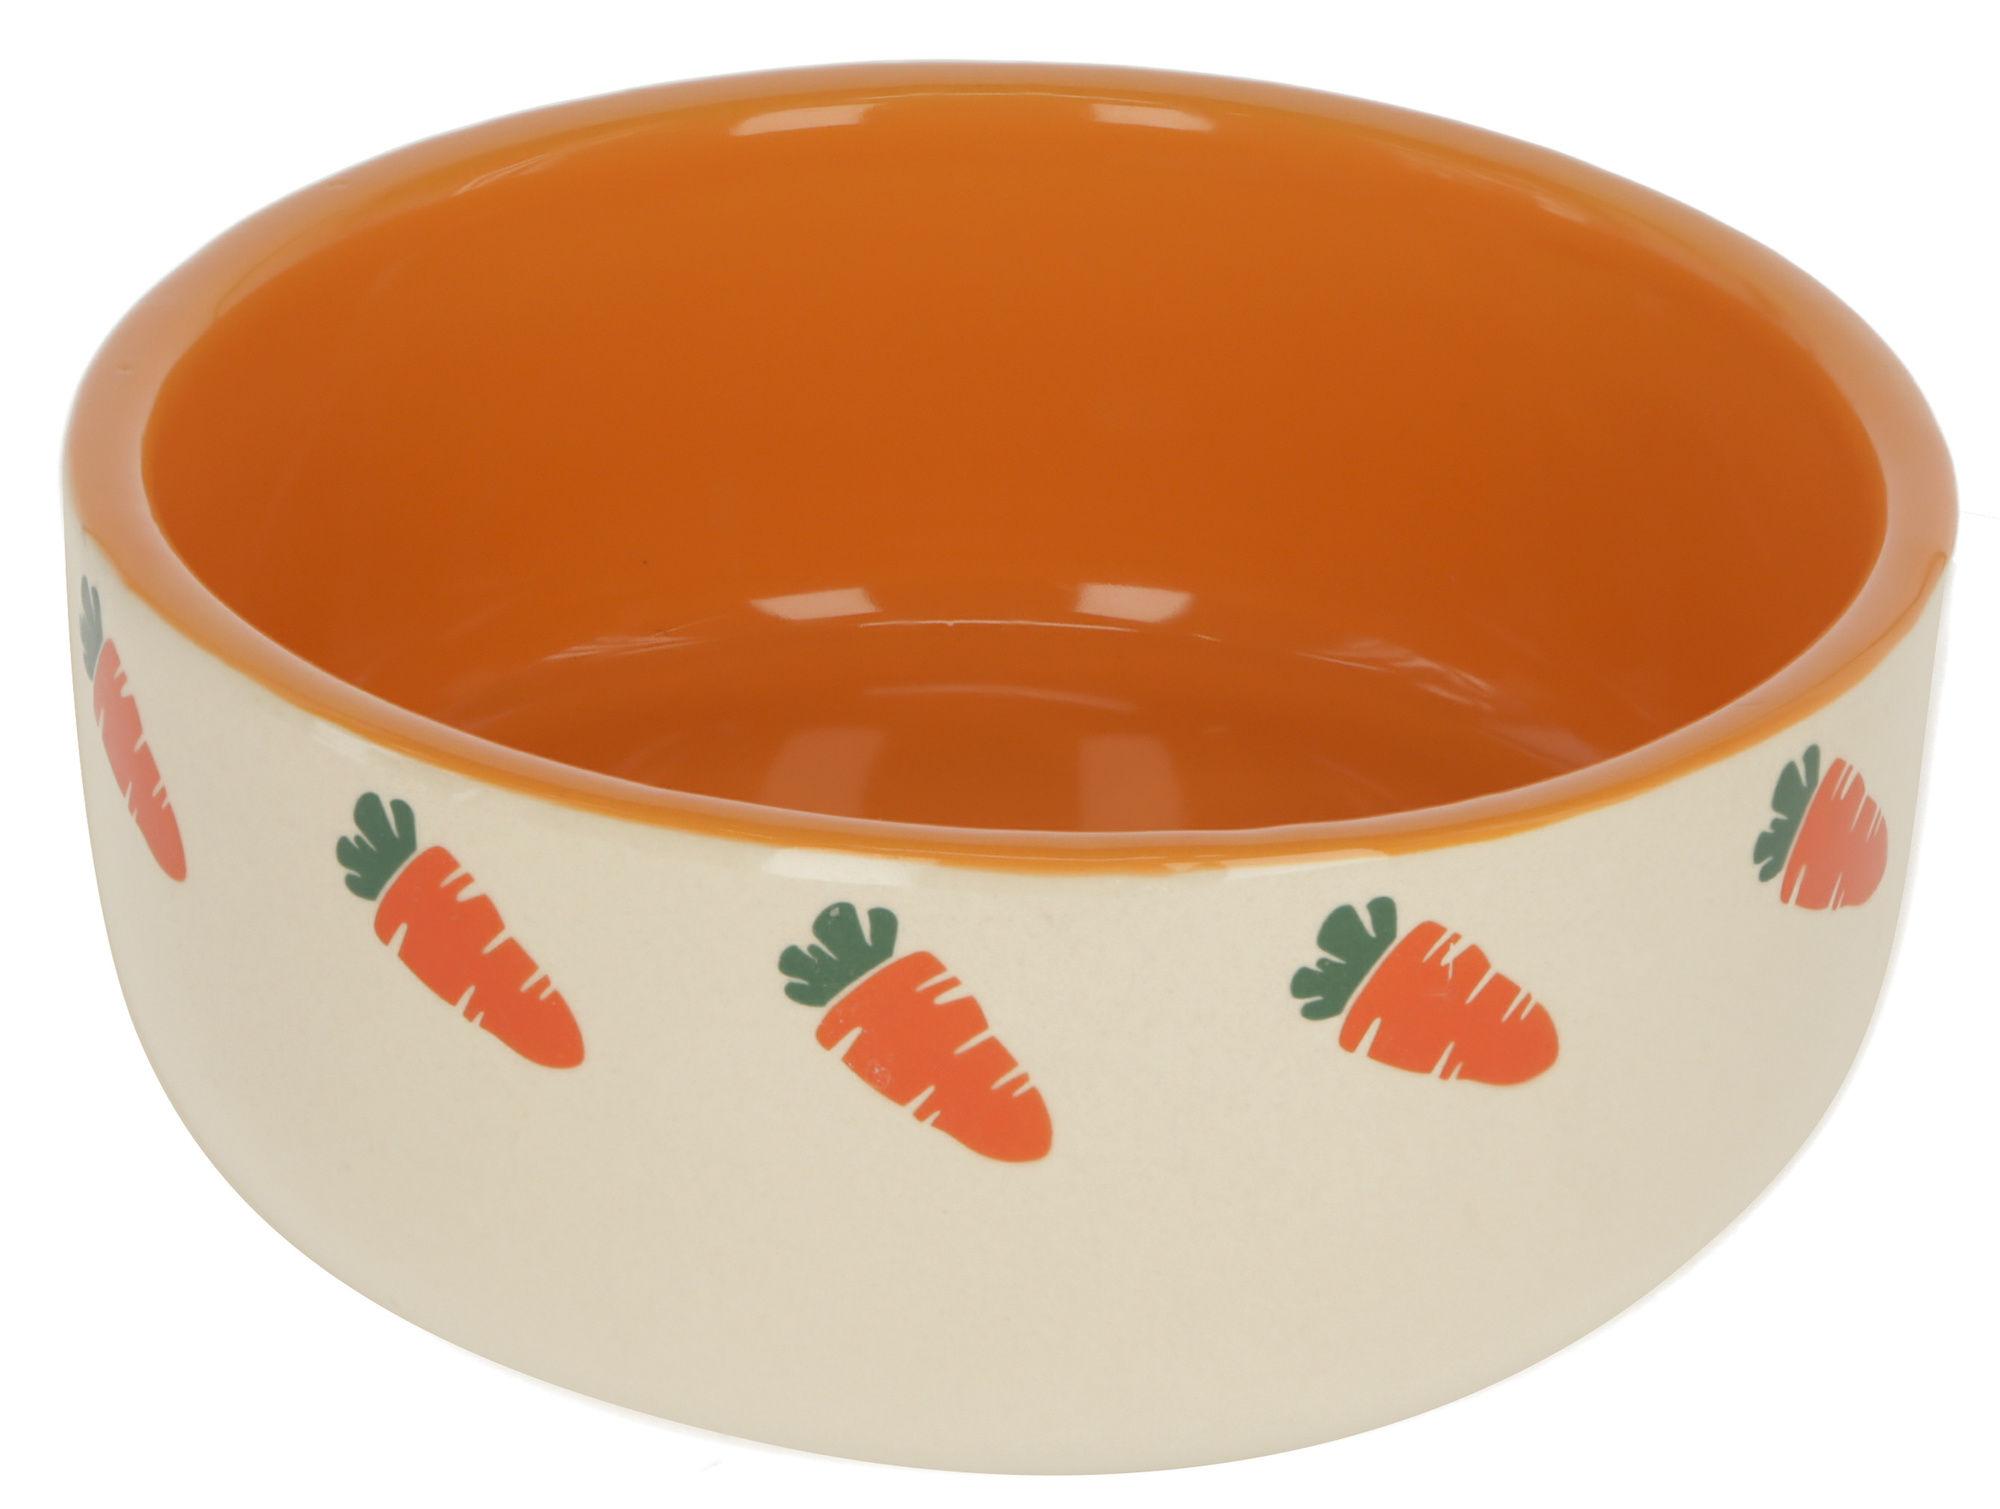 Keramiknapf 500 ml / Ø 13cm für Nager